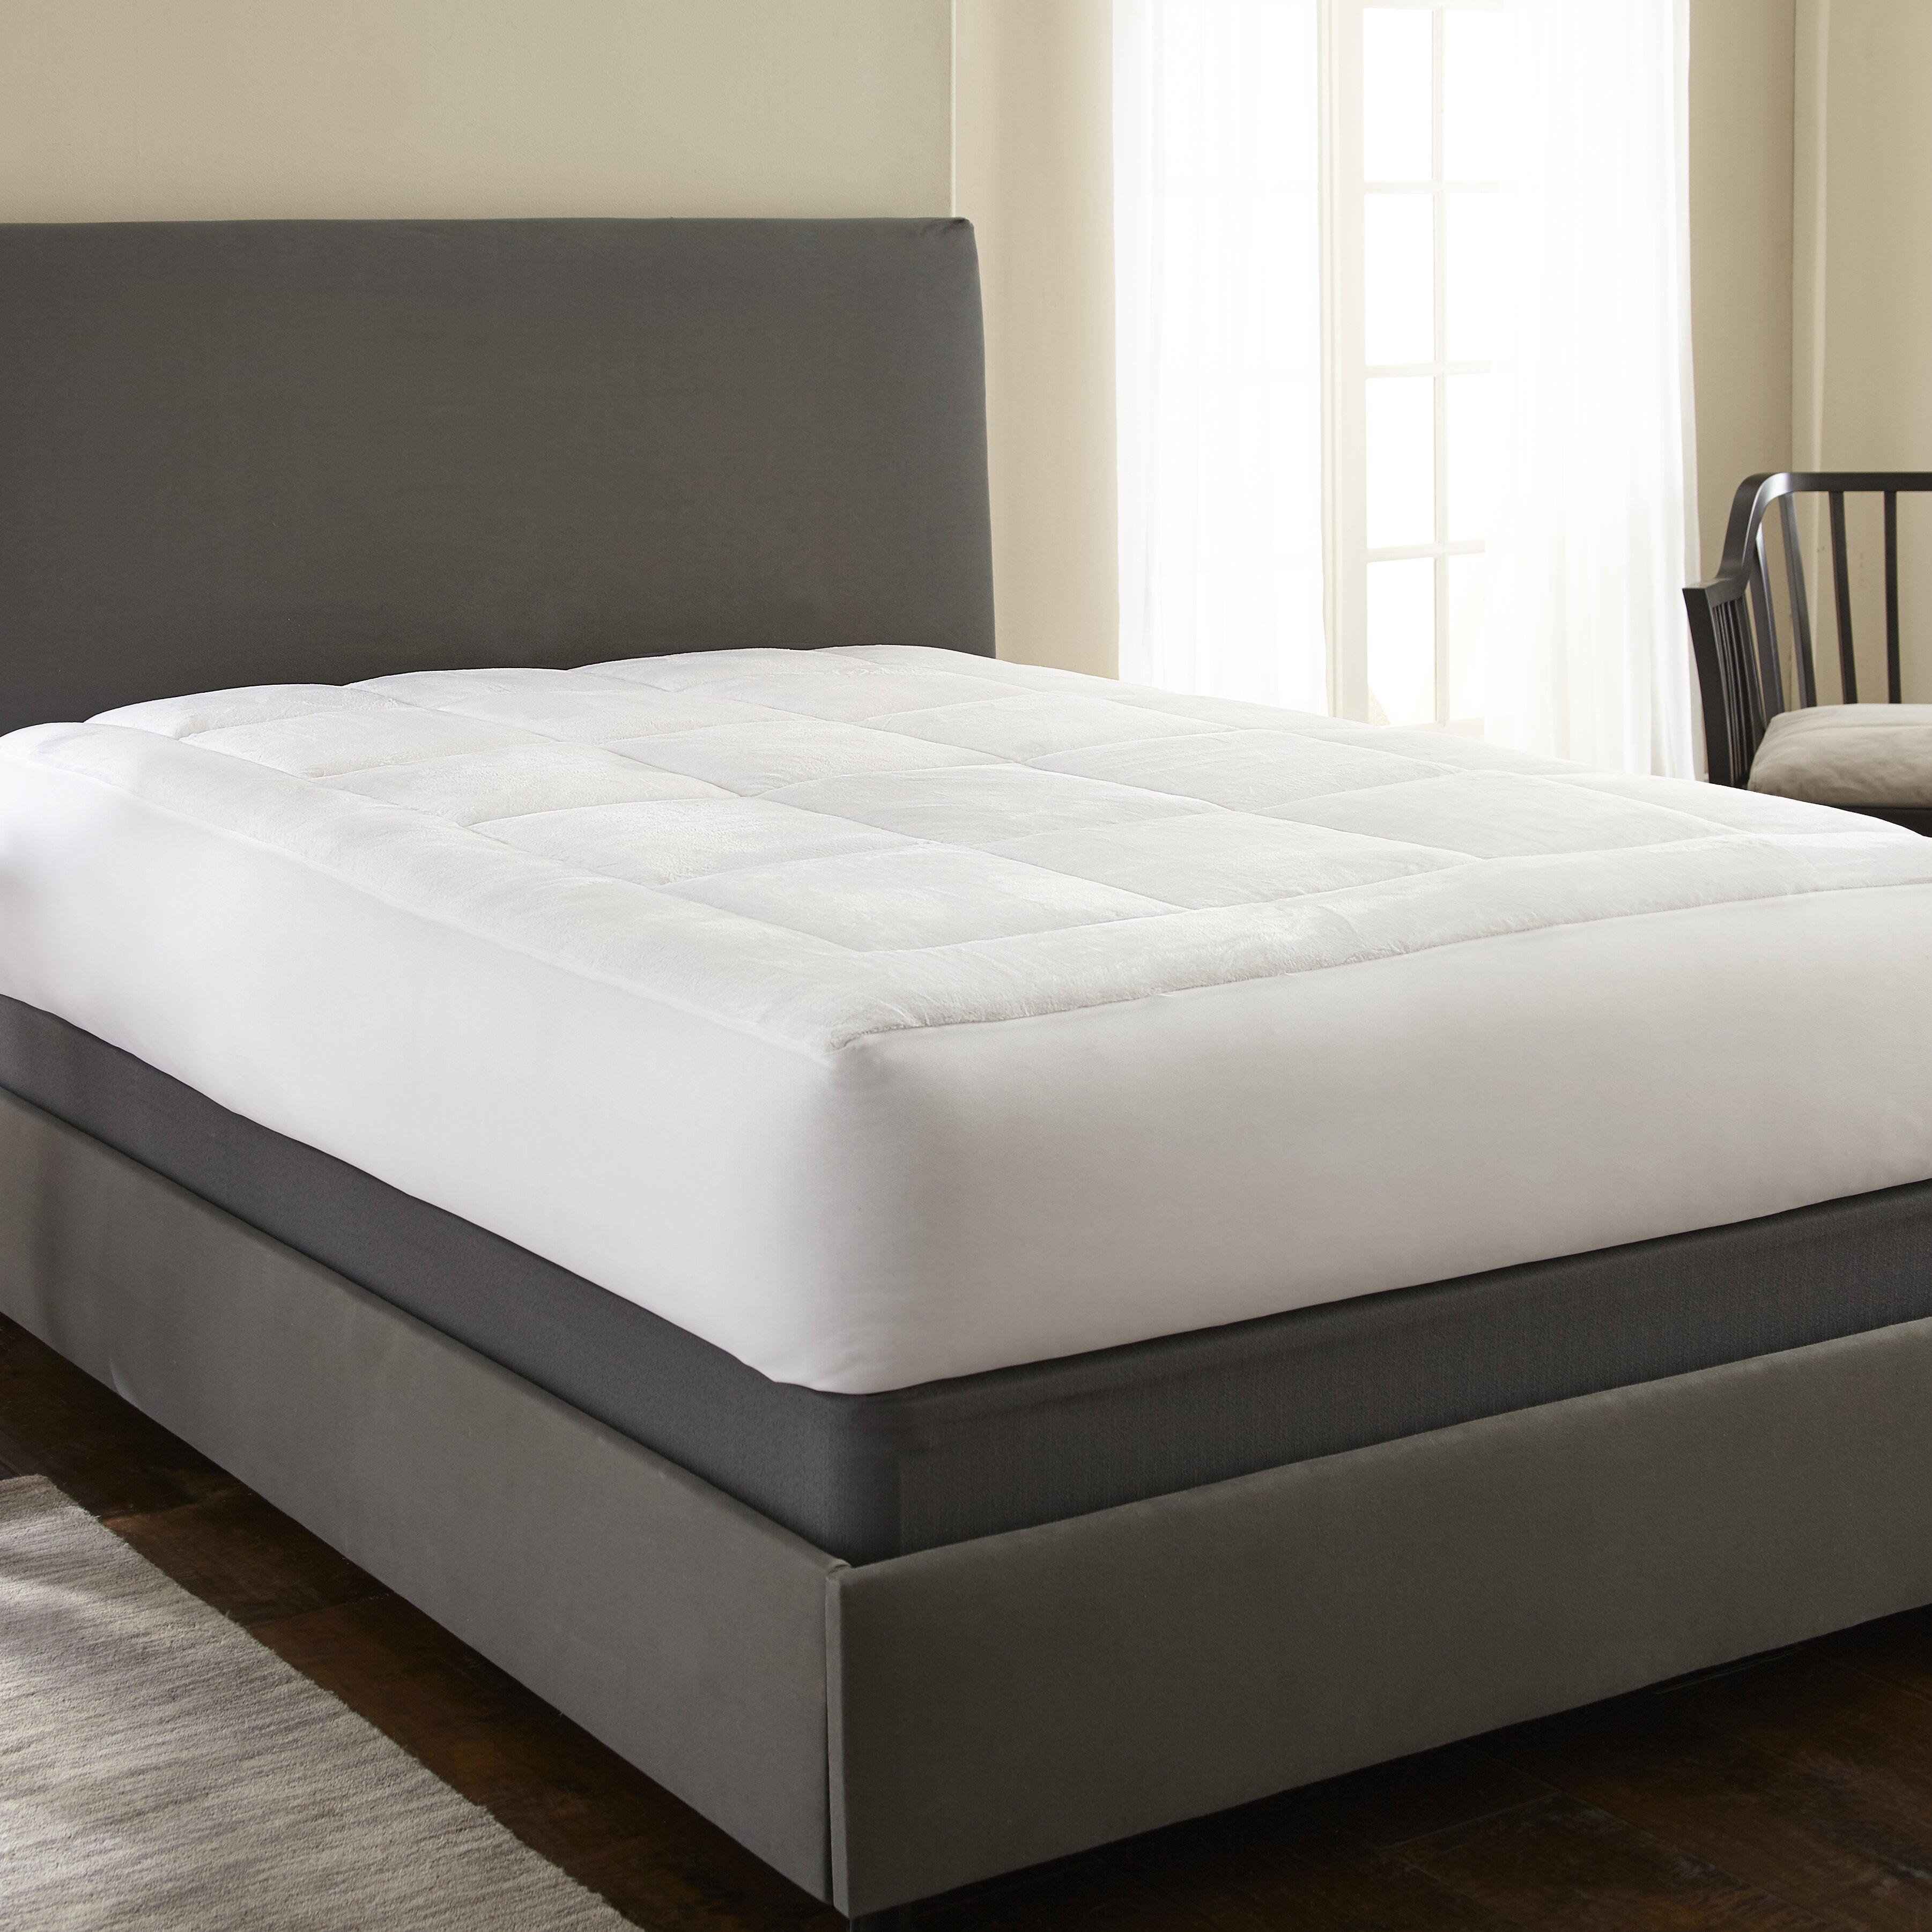 IEnjoy Home Simply Soft™ Pillow Top Luxury Mattress Pad